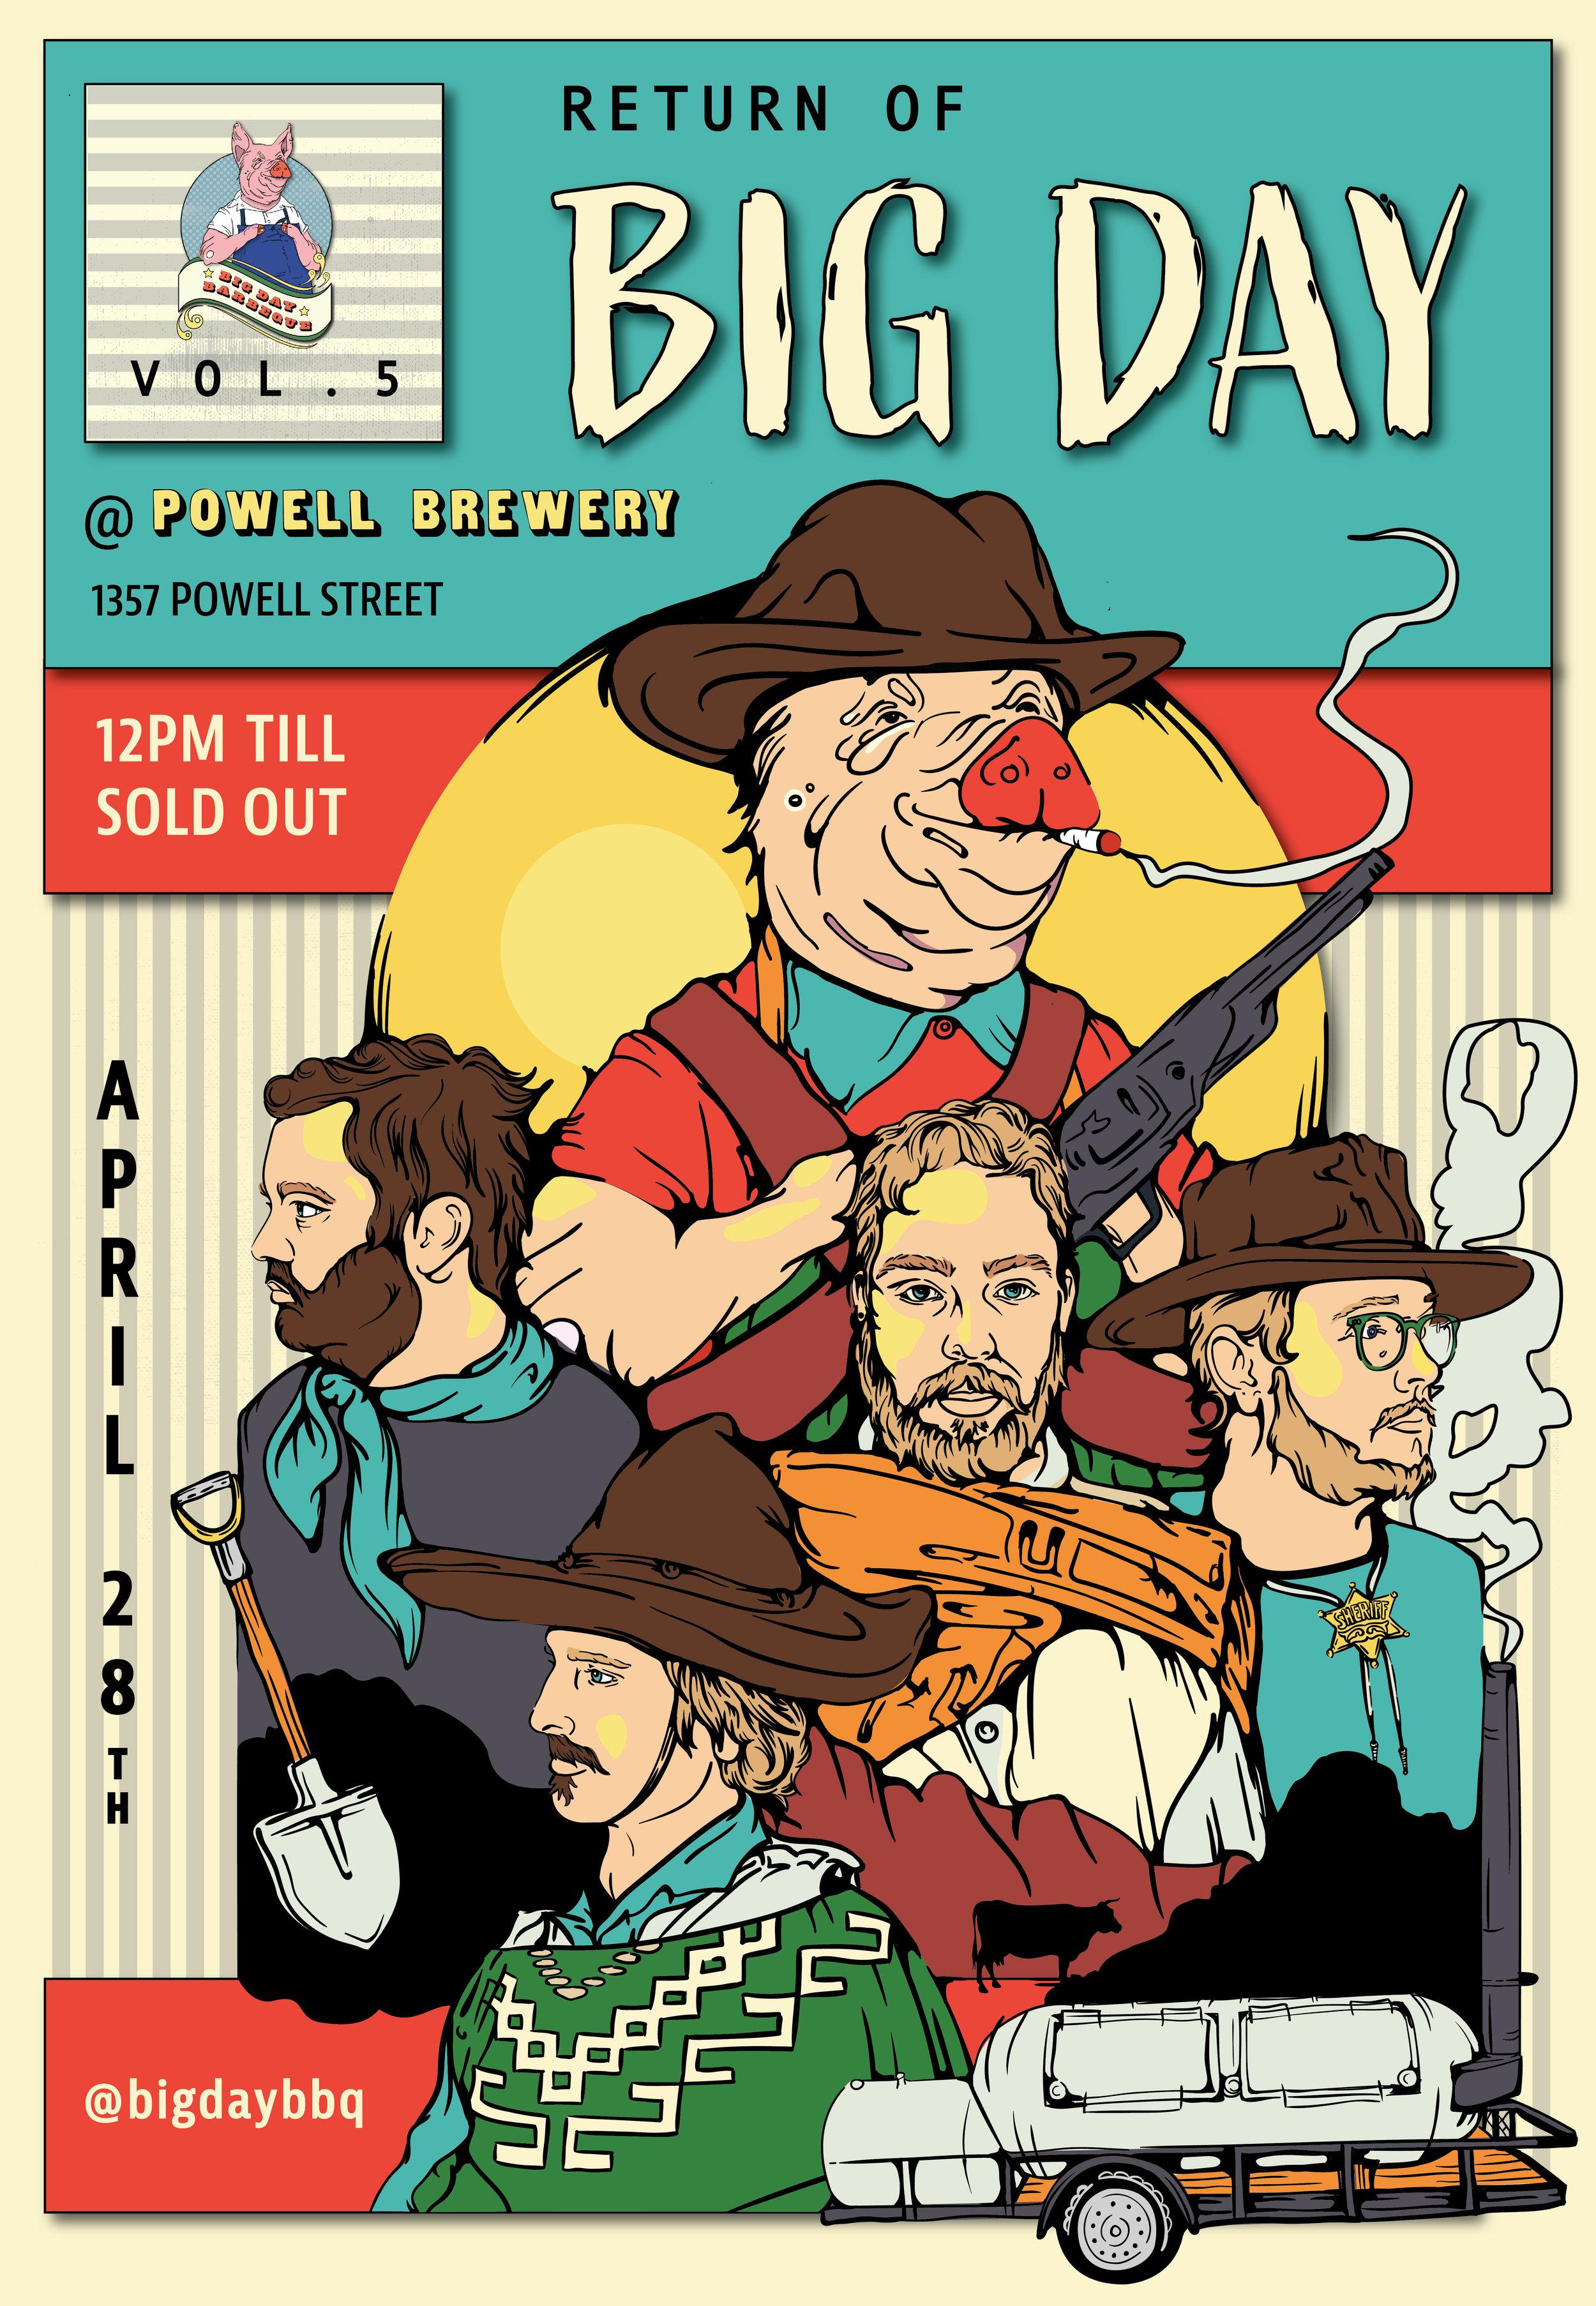 Big Day BBQ Vol.5 (website)-01.jpg